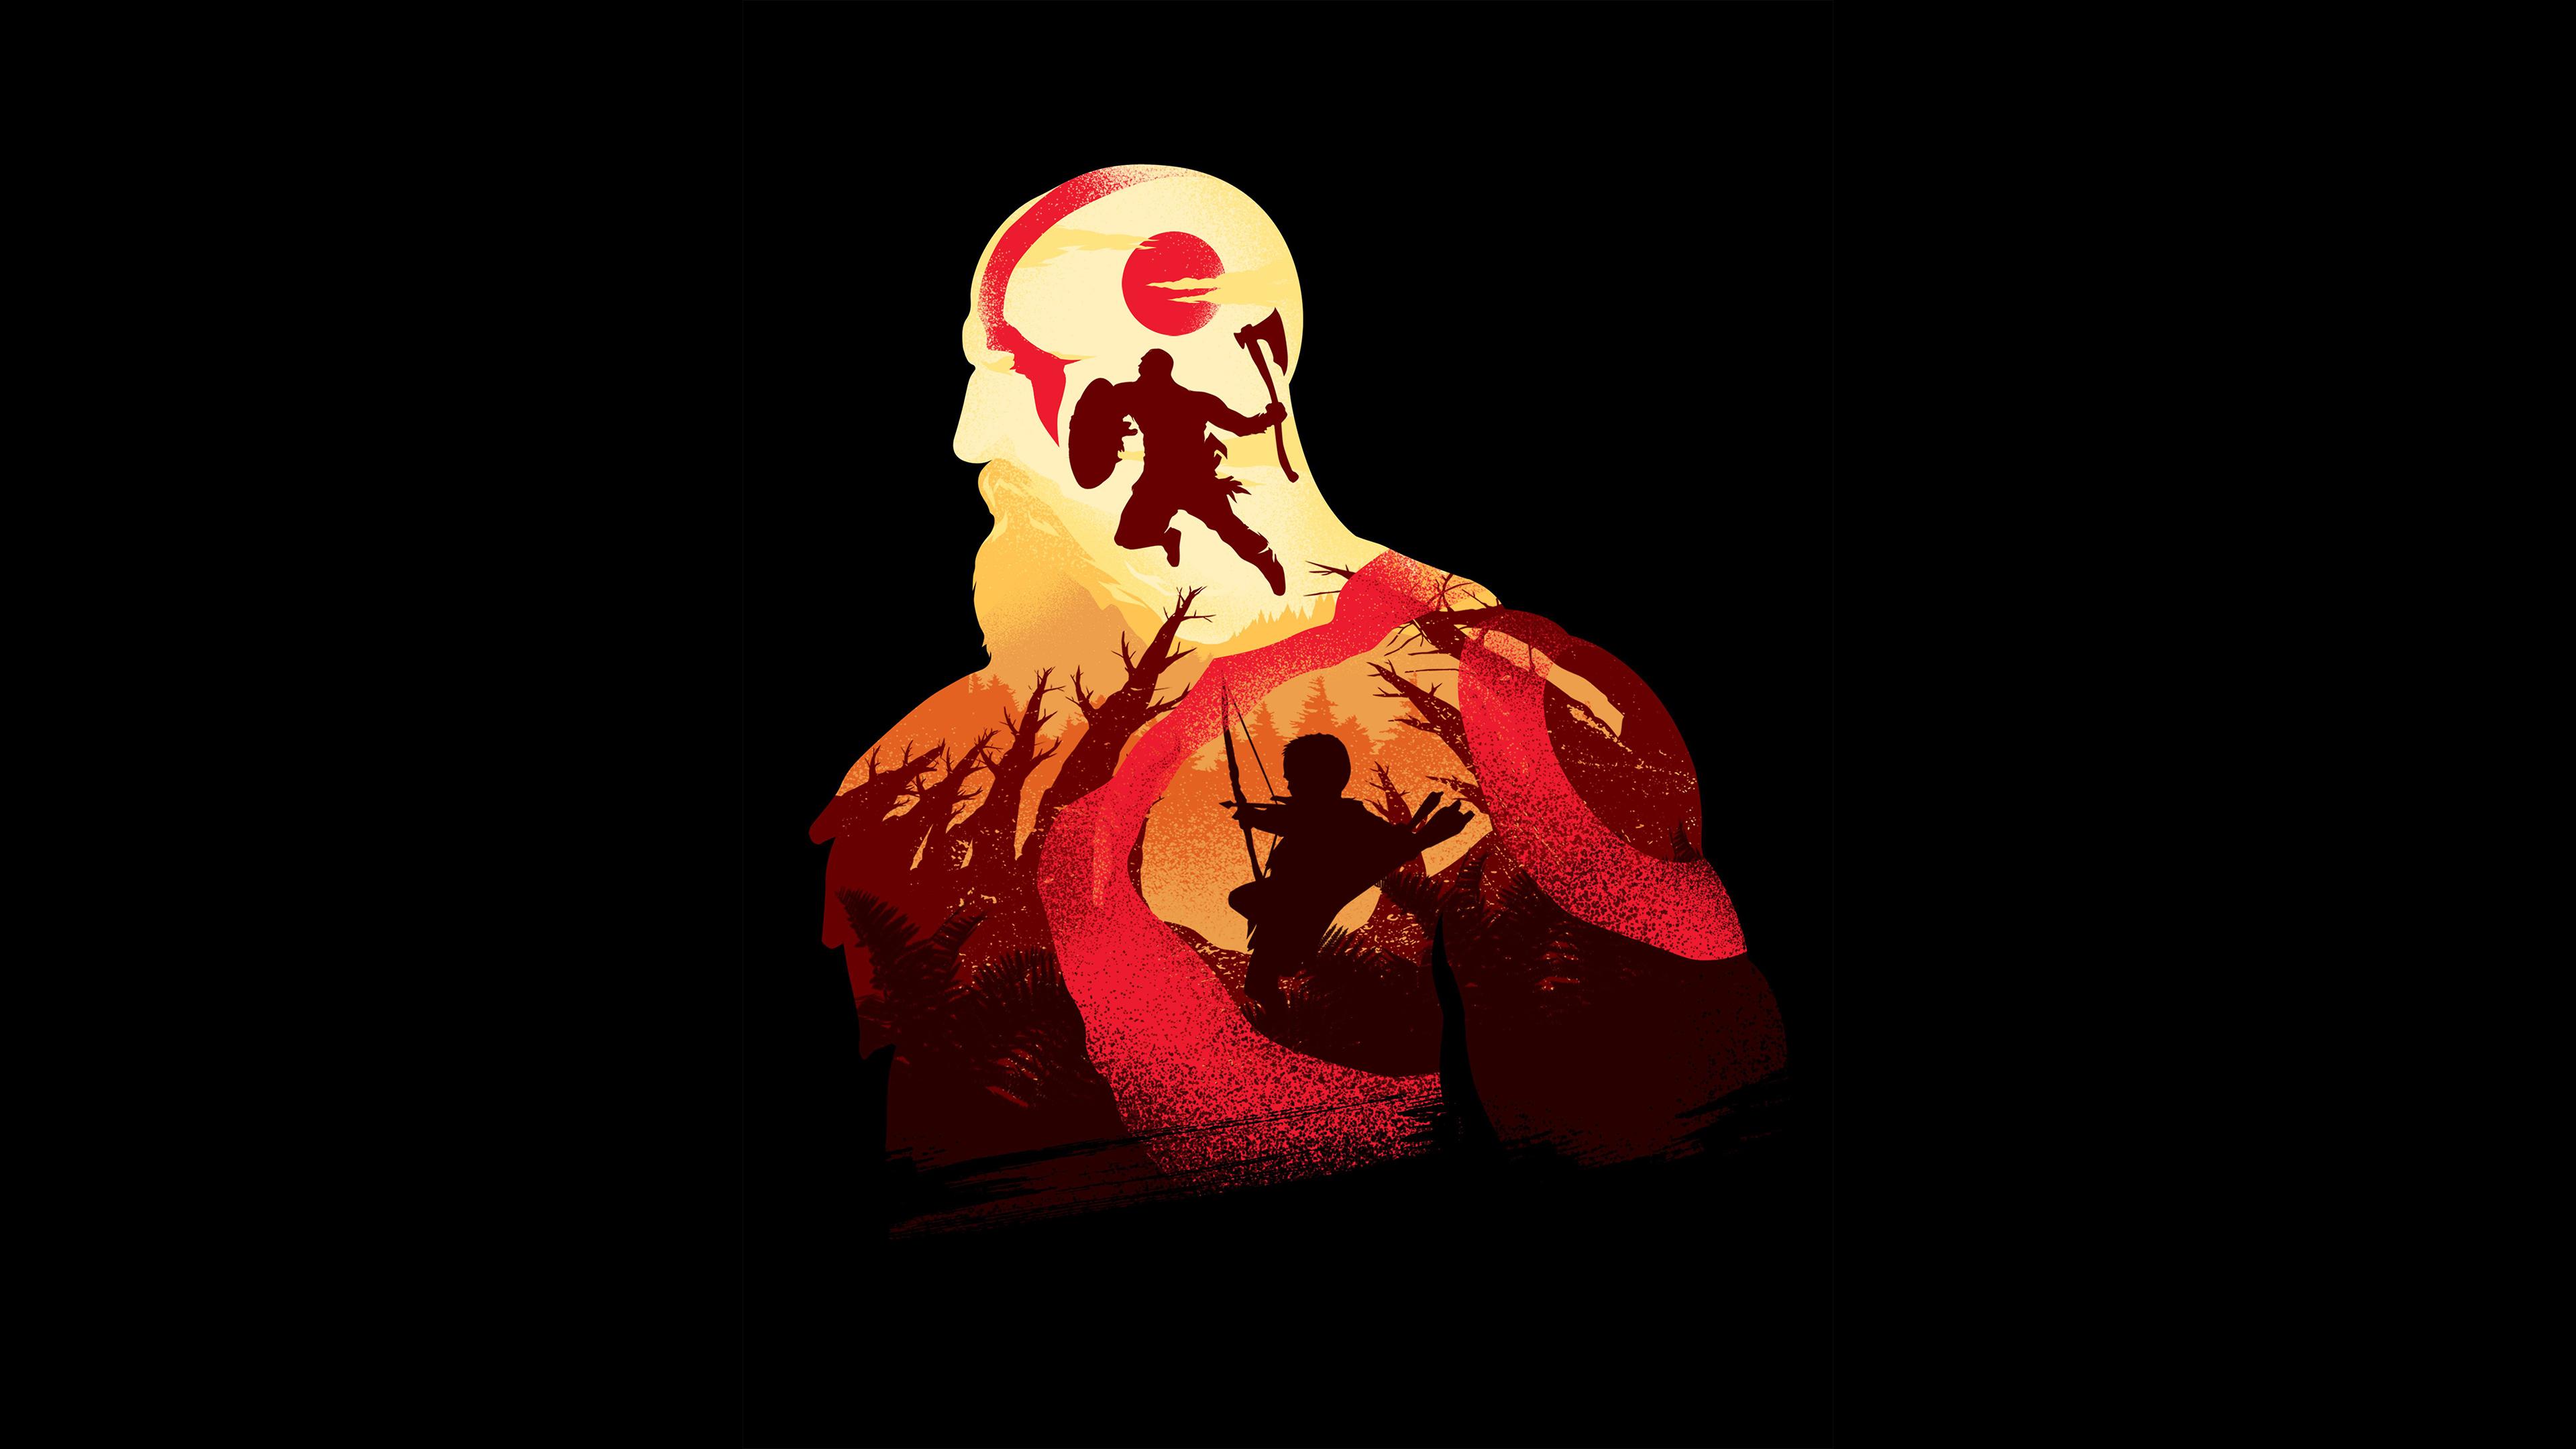 kratos in god of war 4k minimalism 1547319361 - Kratos In God Of War 4K Minimalism - ps games wallpapers, minimalism wallpapers, kratos wallpapers, hd-wallpapers, god of war wallpapers, god of war 4 wallpapers, games wallpapers, 4k-wallpapers